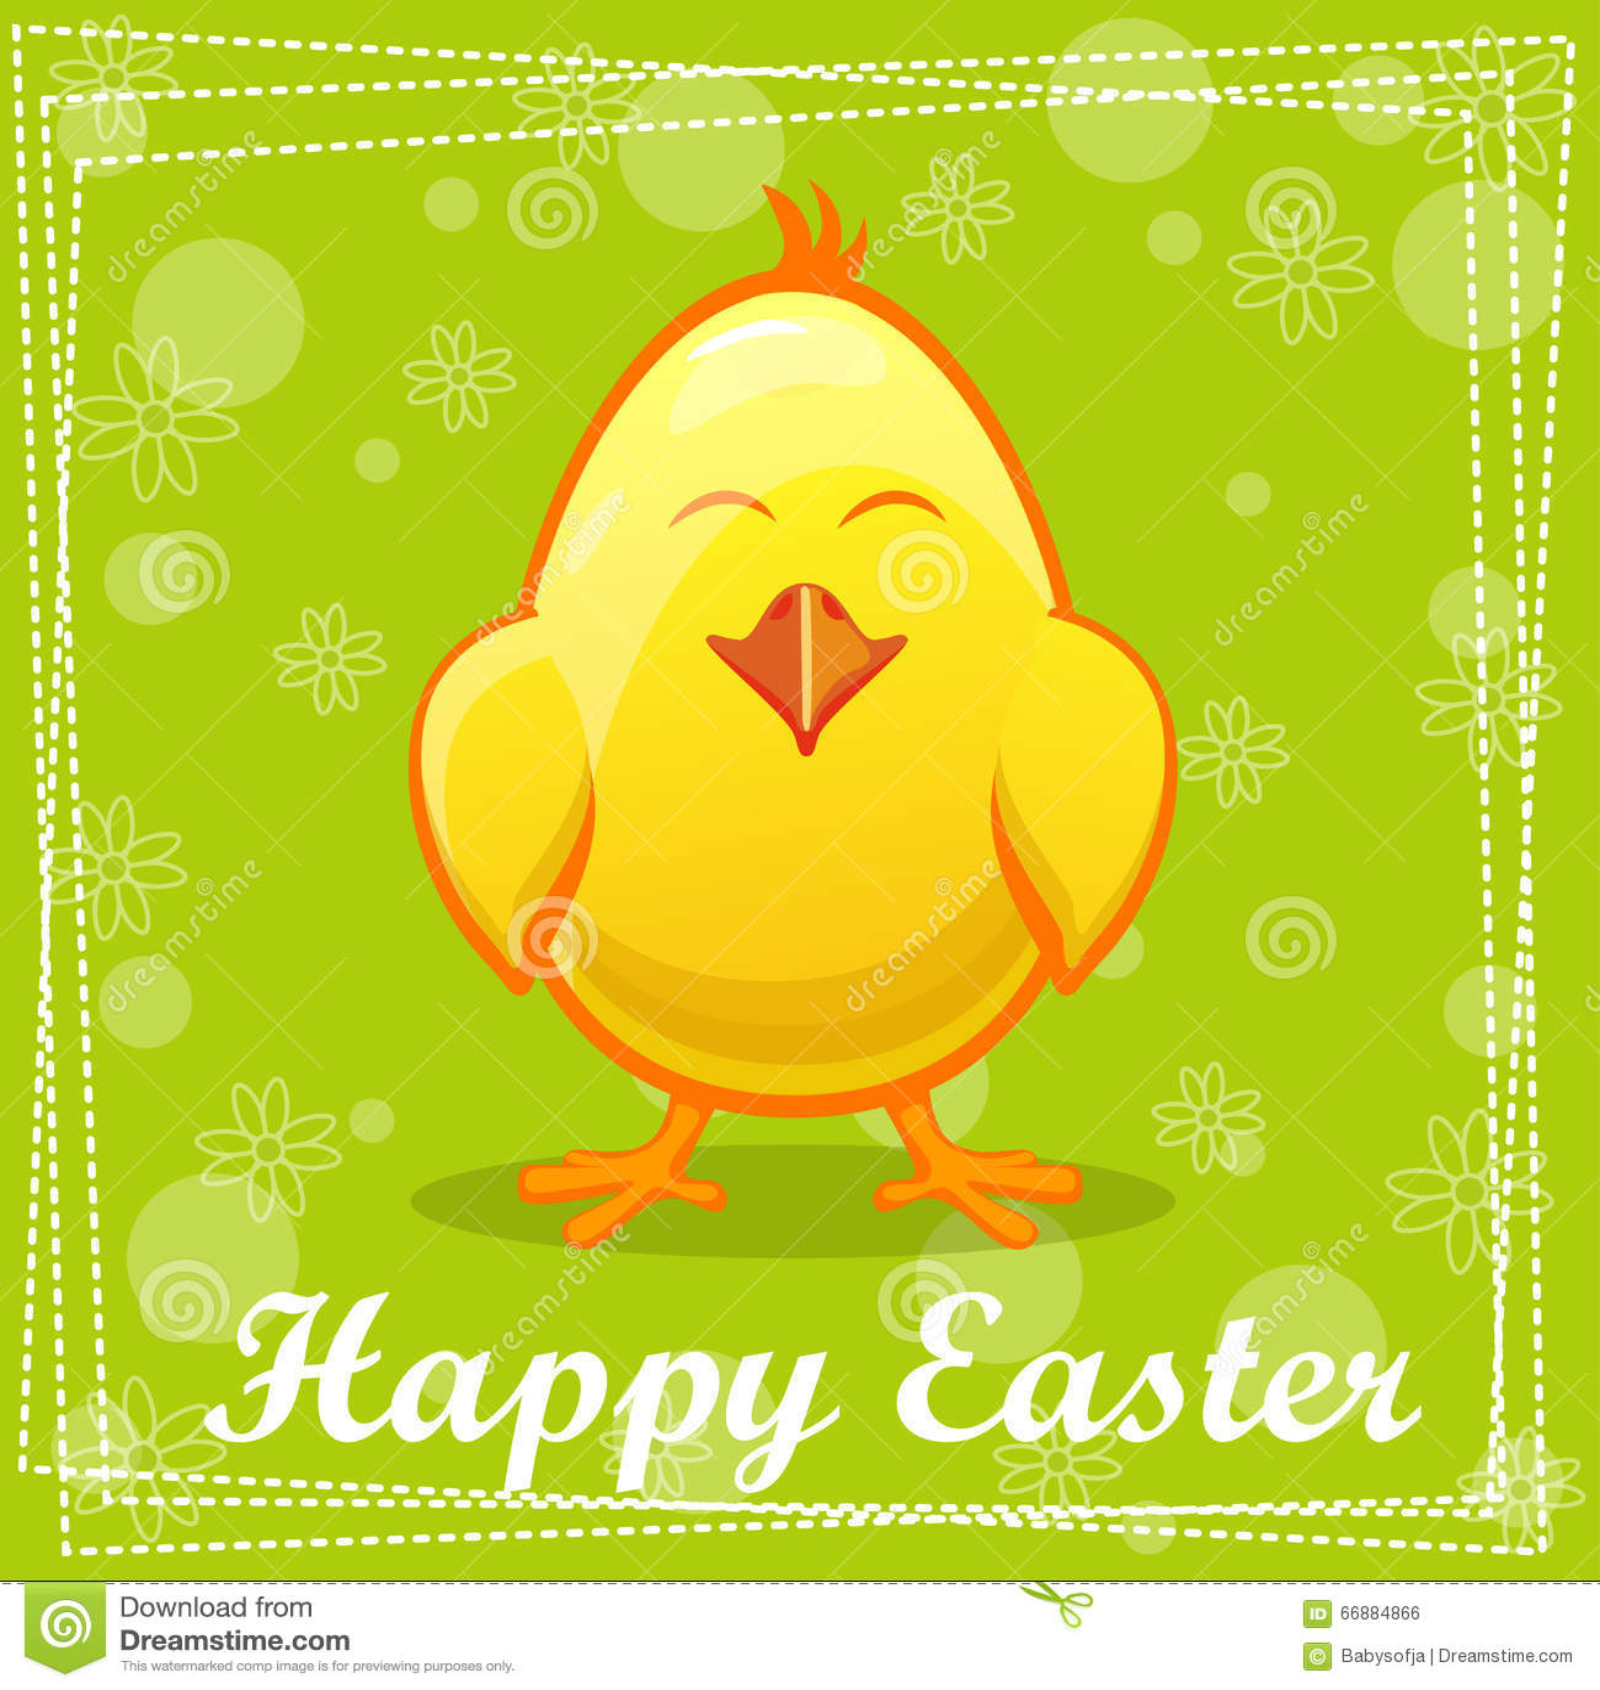 cute yellow cartoon chicken stock vector   image 66884866